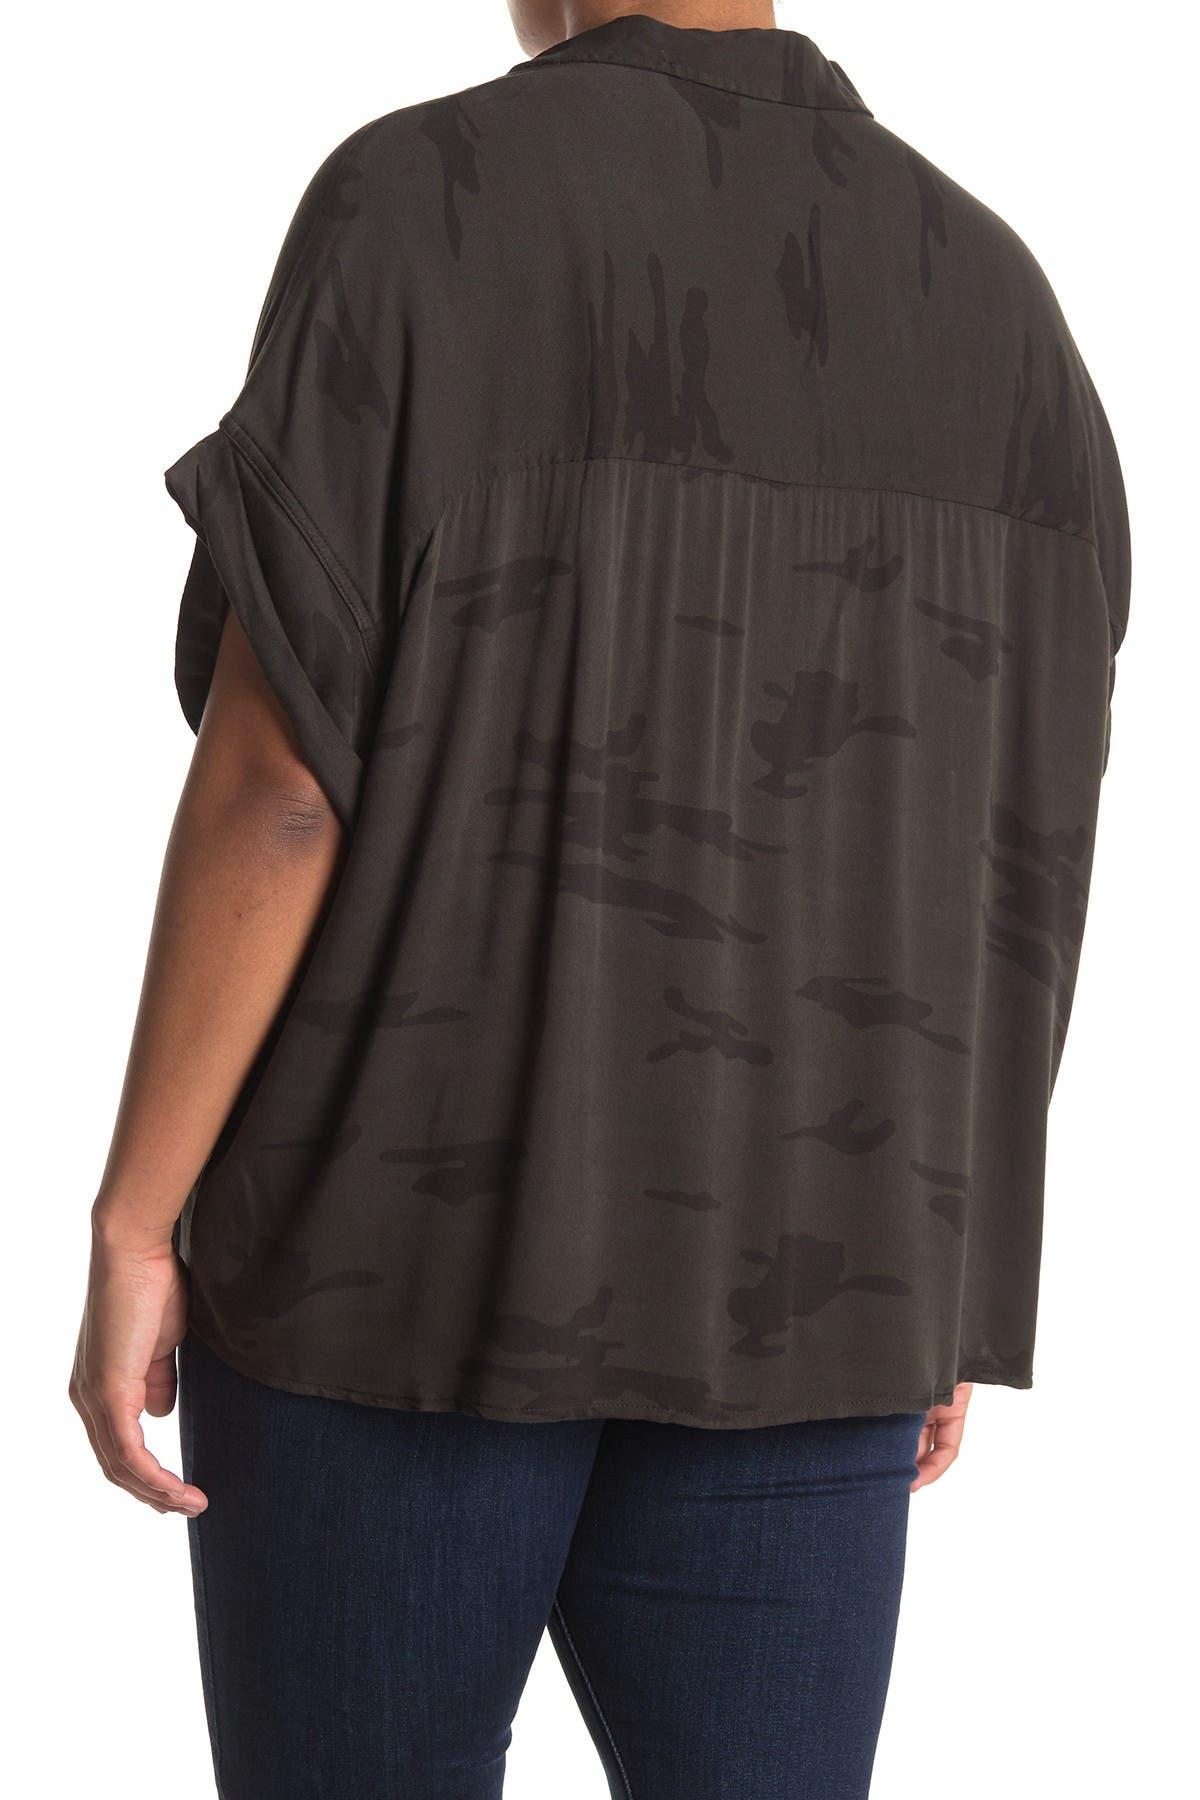 Image of Sanctuary Camo Short Sleeve Button Down Shirt